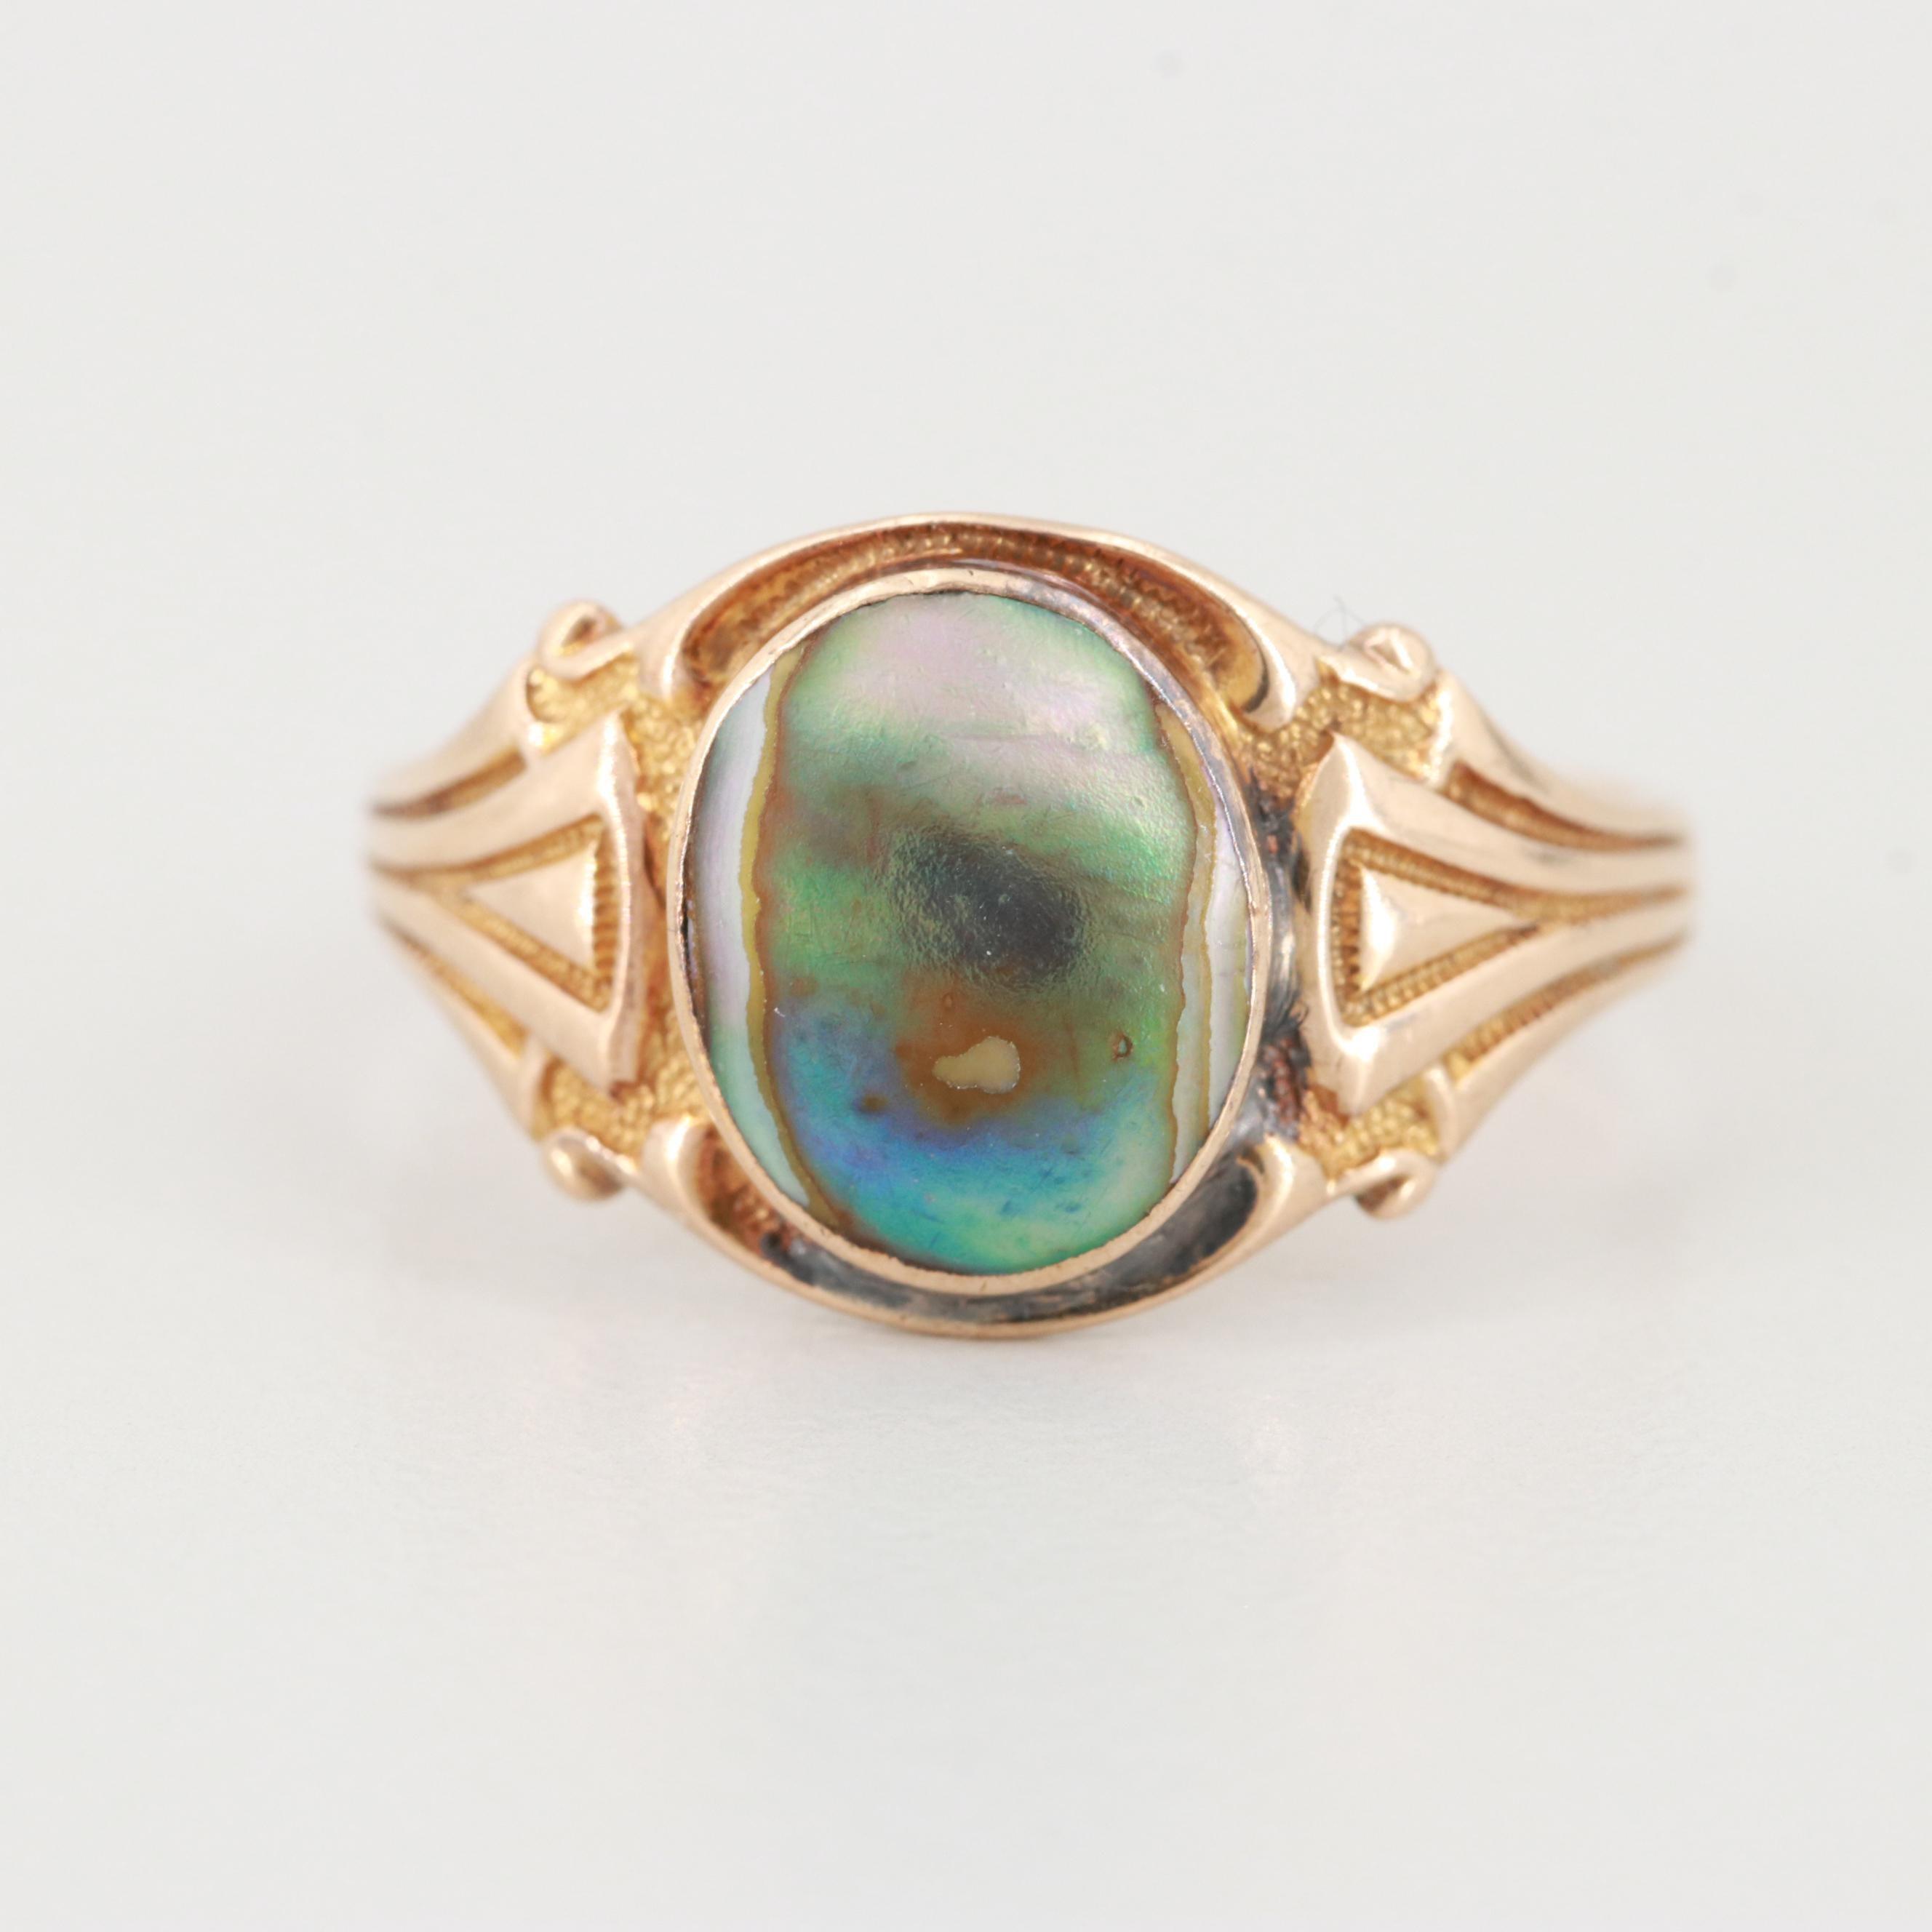 Vintage 10K Yellow Gold Abalone Ring